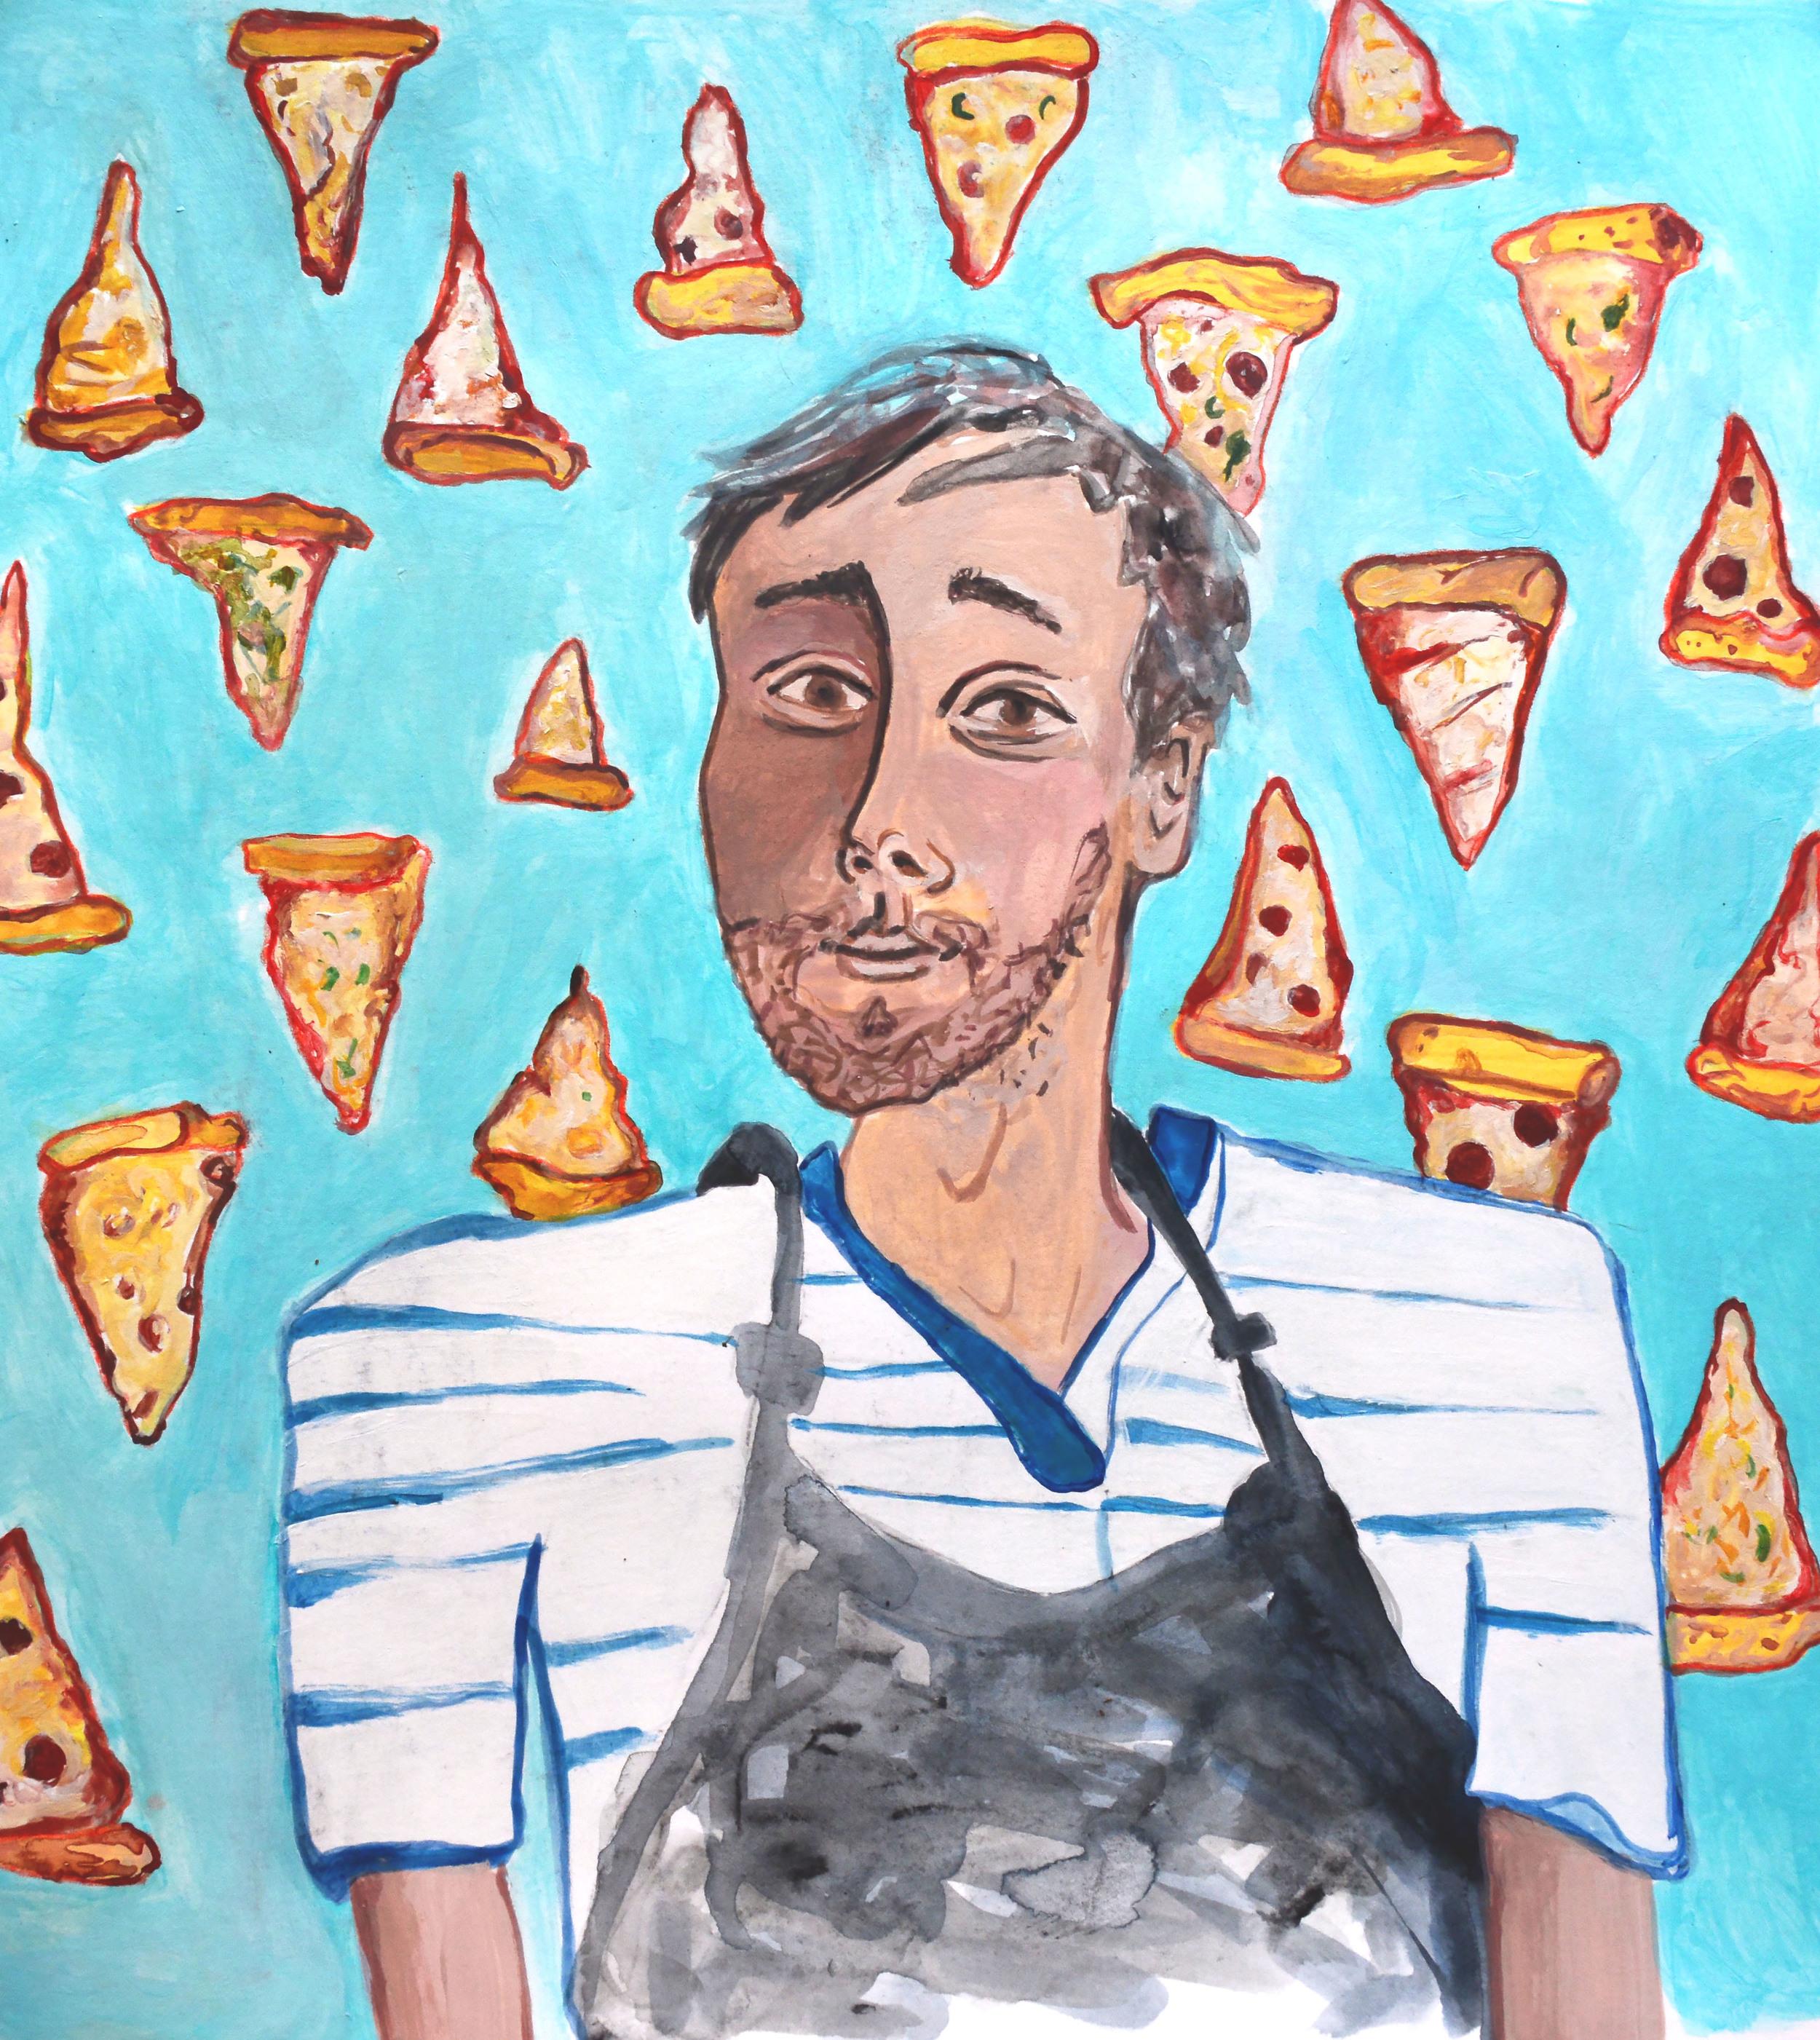 PizzaGuy.jpg